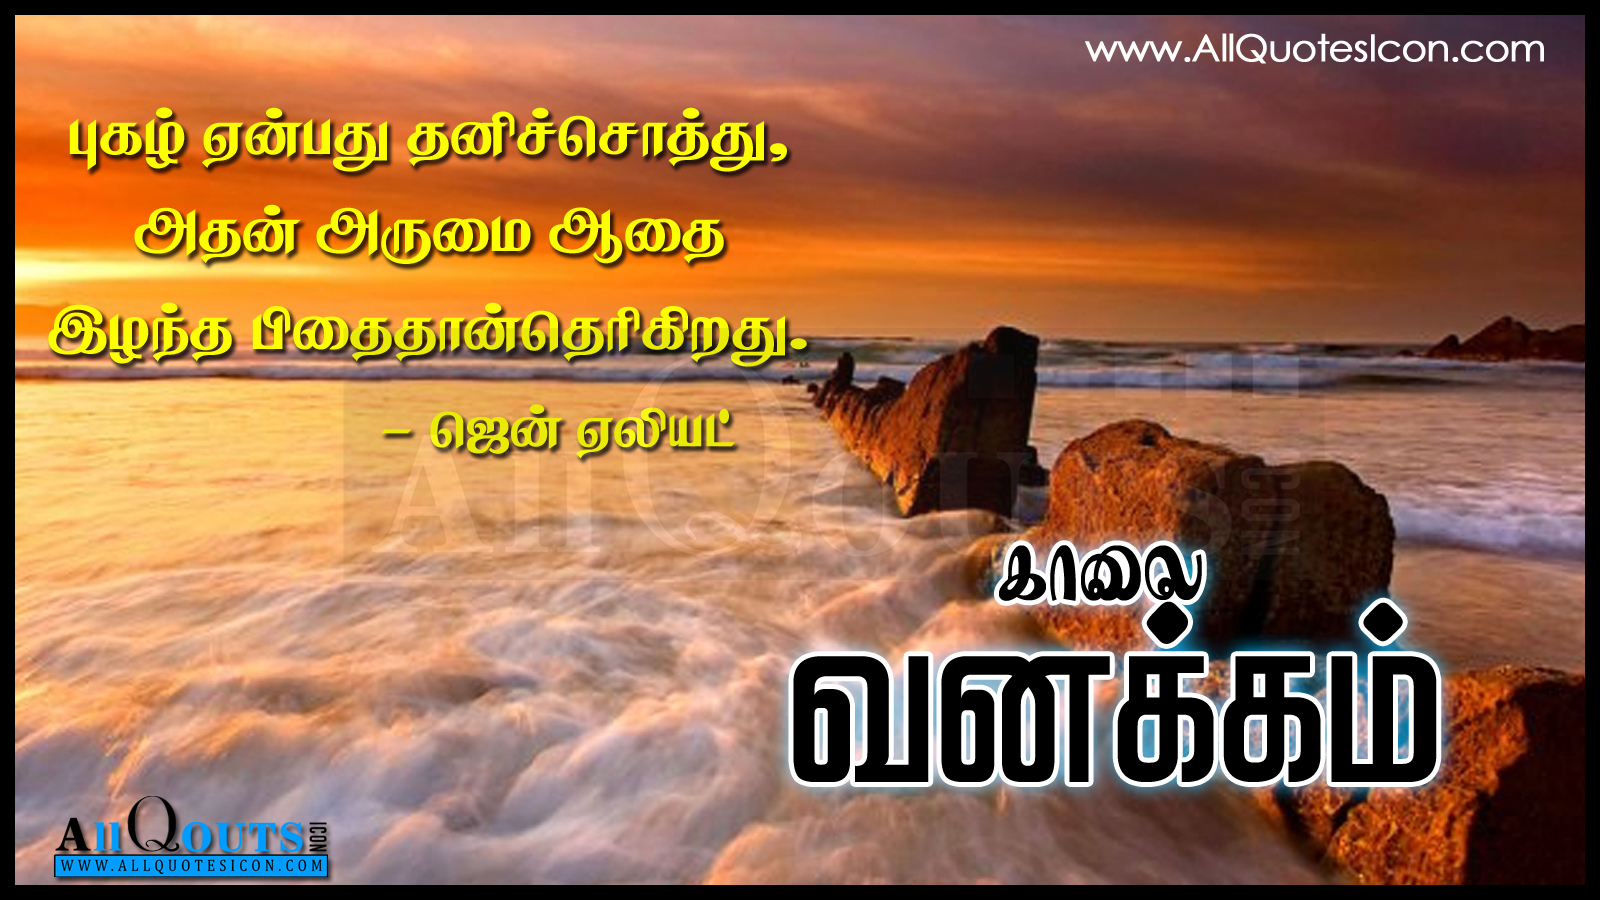 Good Morning Hd Images Tamil Archidev